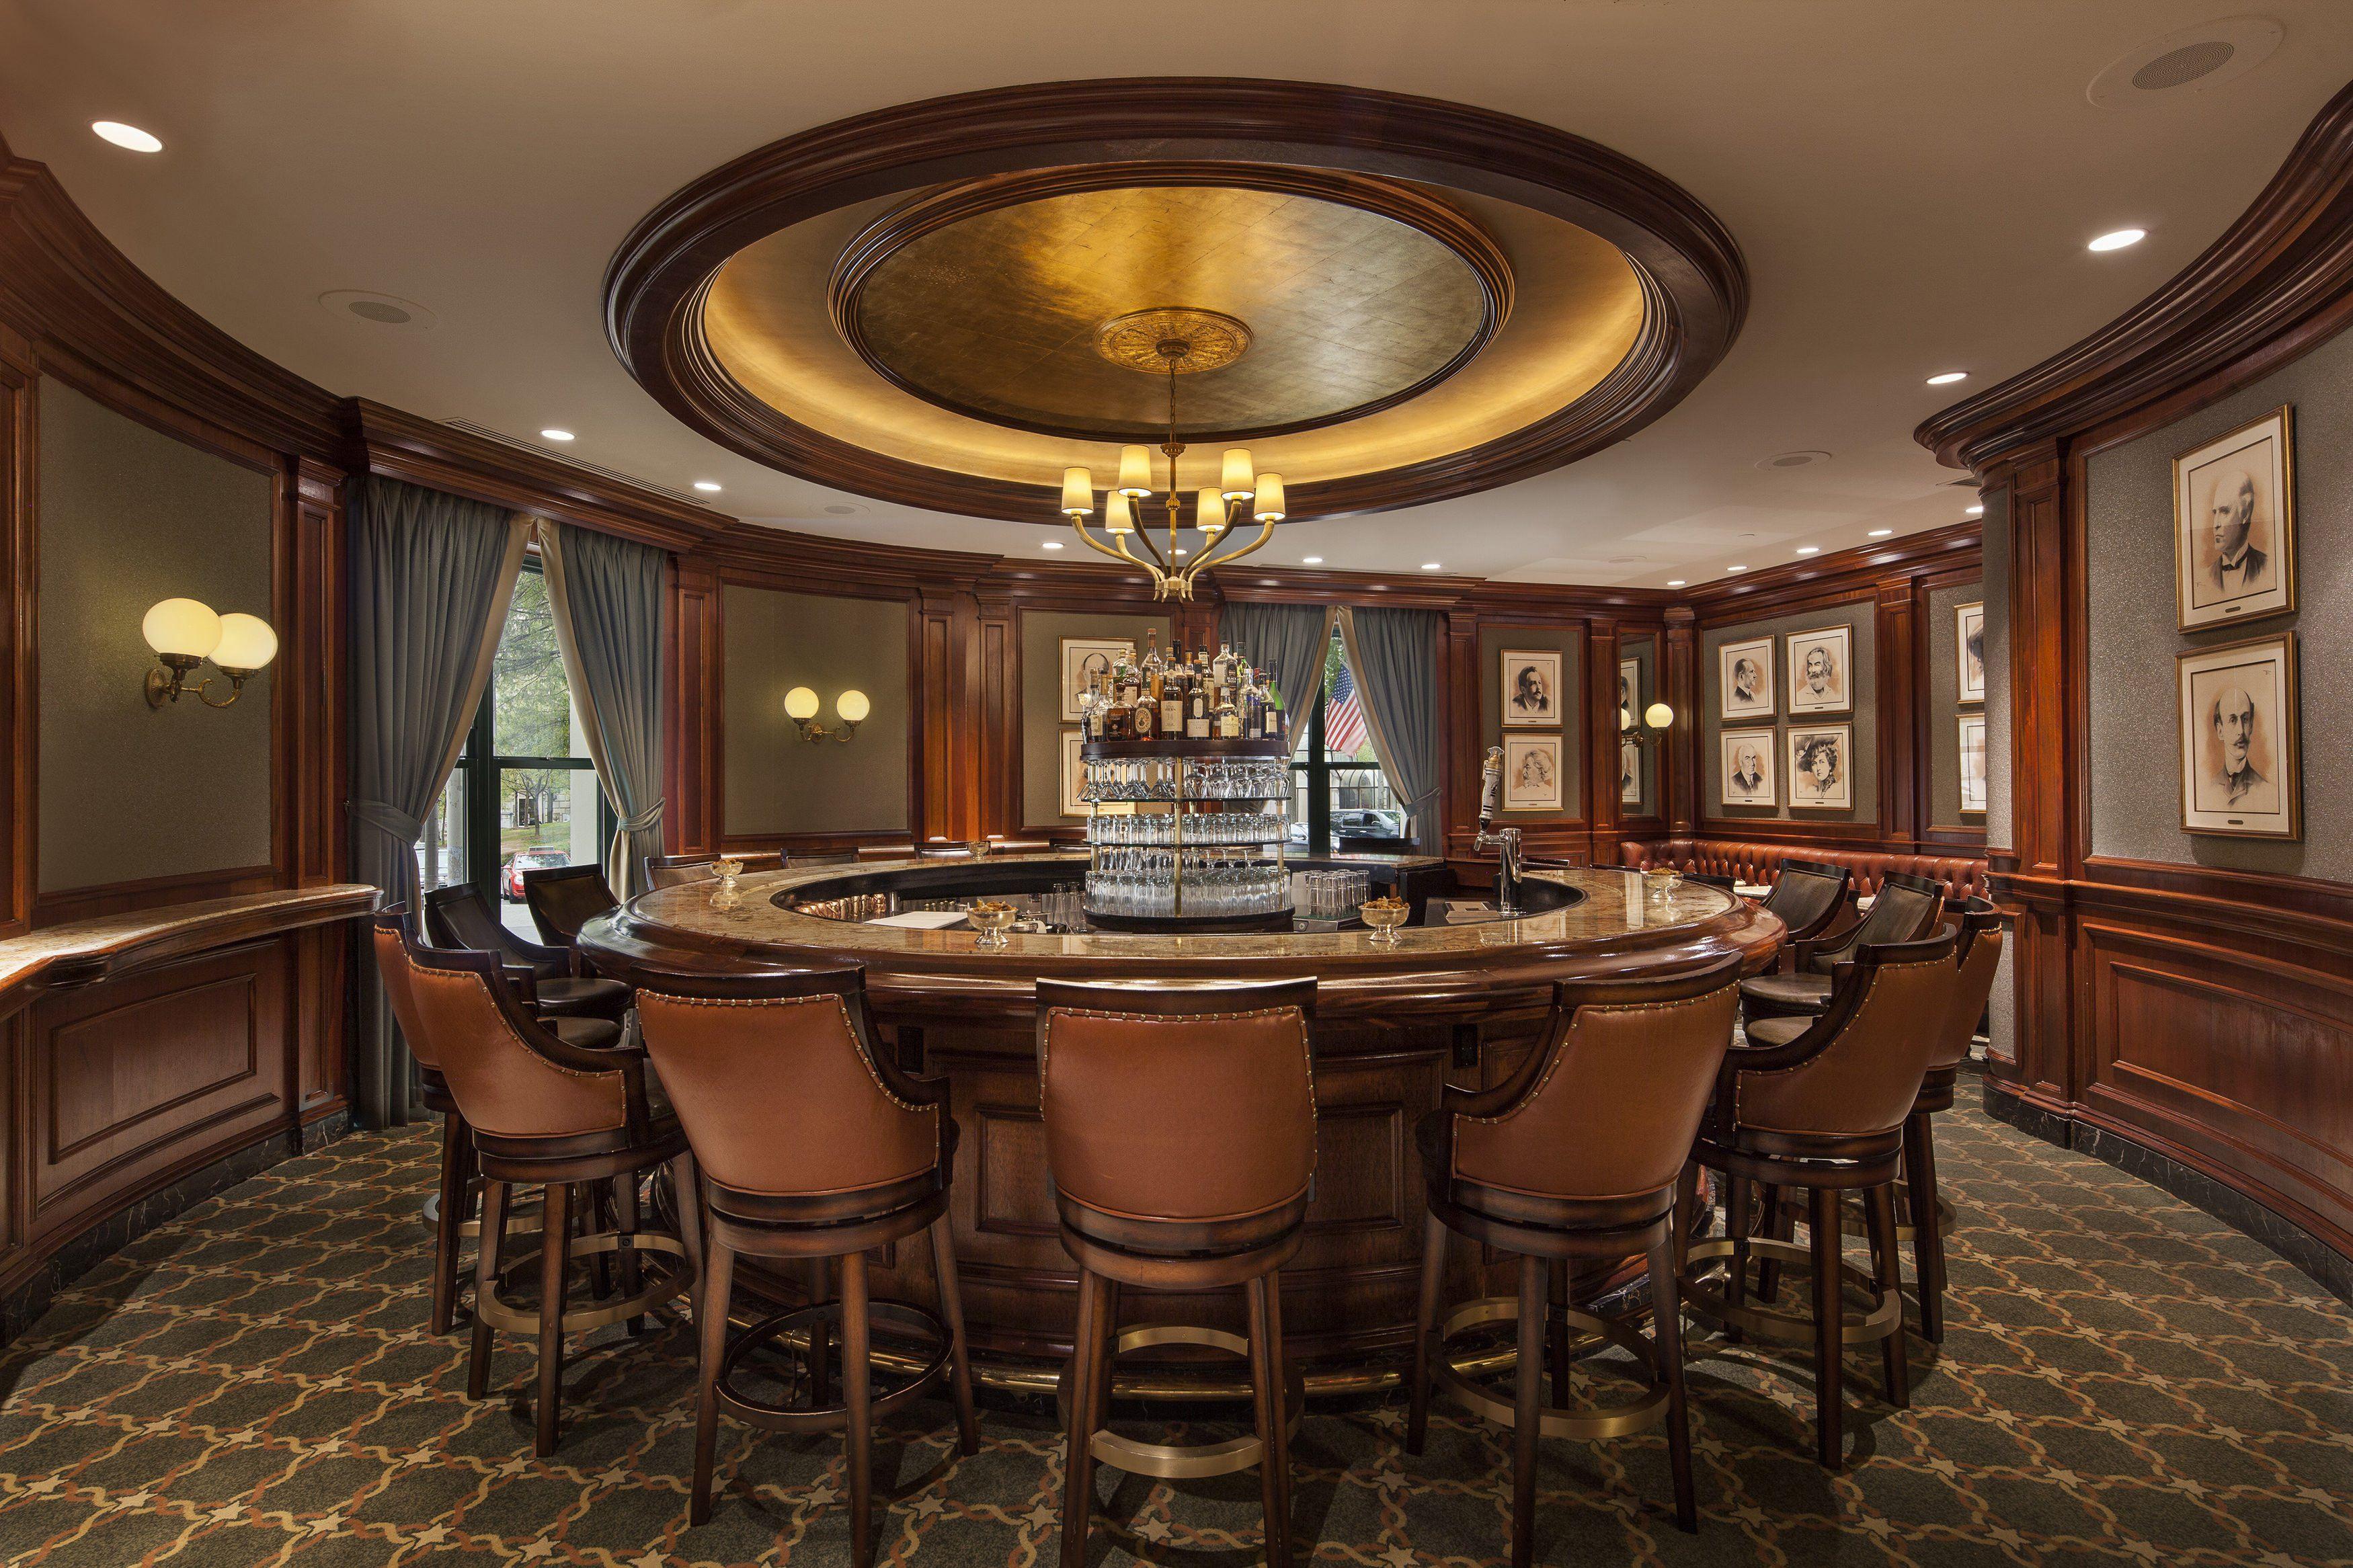 The circular Round Robin Bar at the Willard Intercontinental